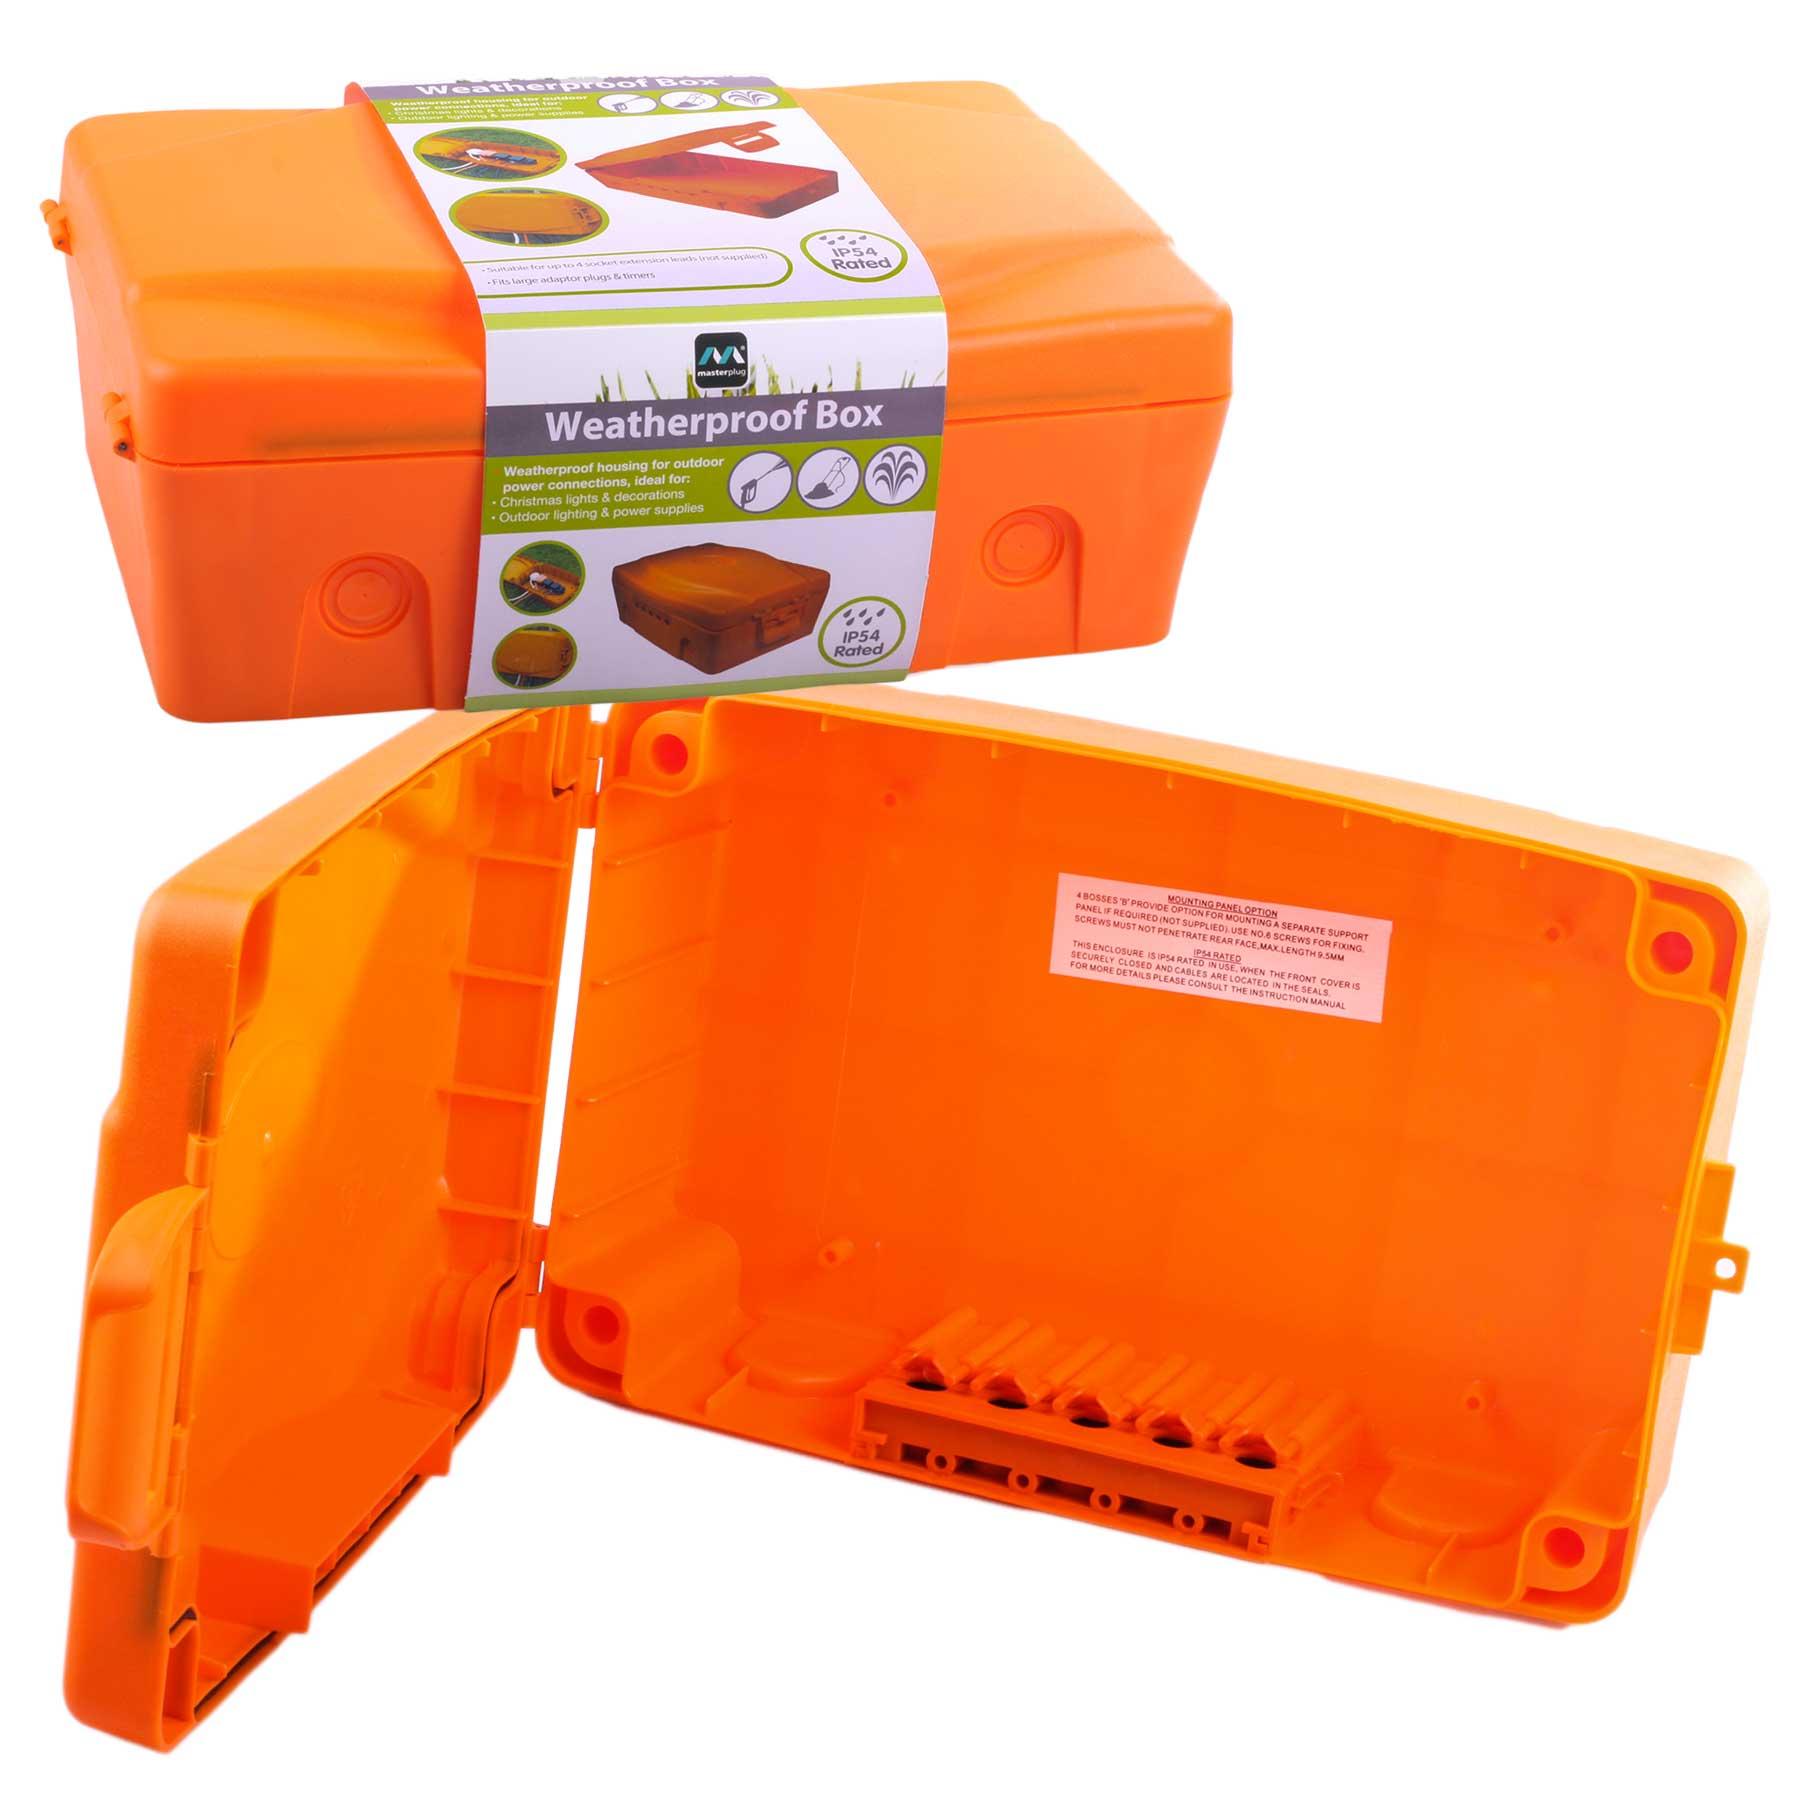 Masterplug Weatherproof Junction Box Outdoor Electric Power Connection Enclosure Ebay